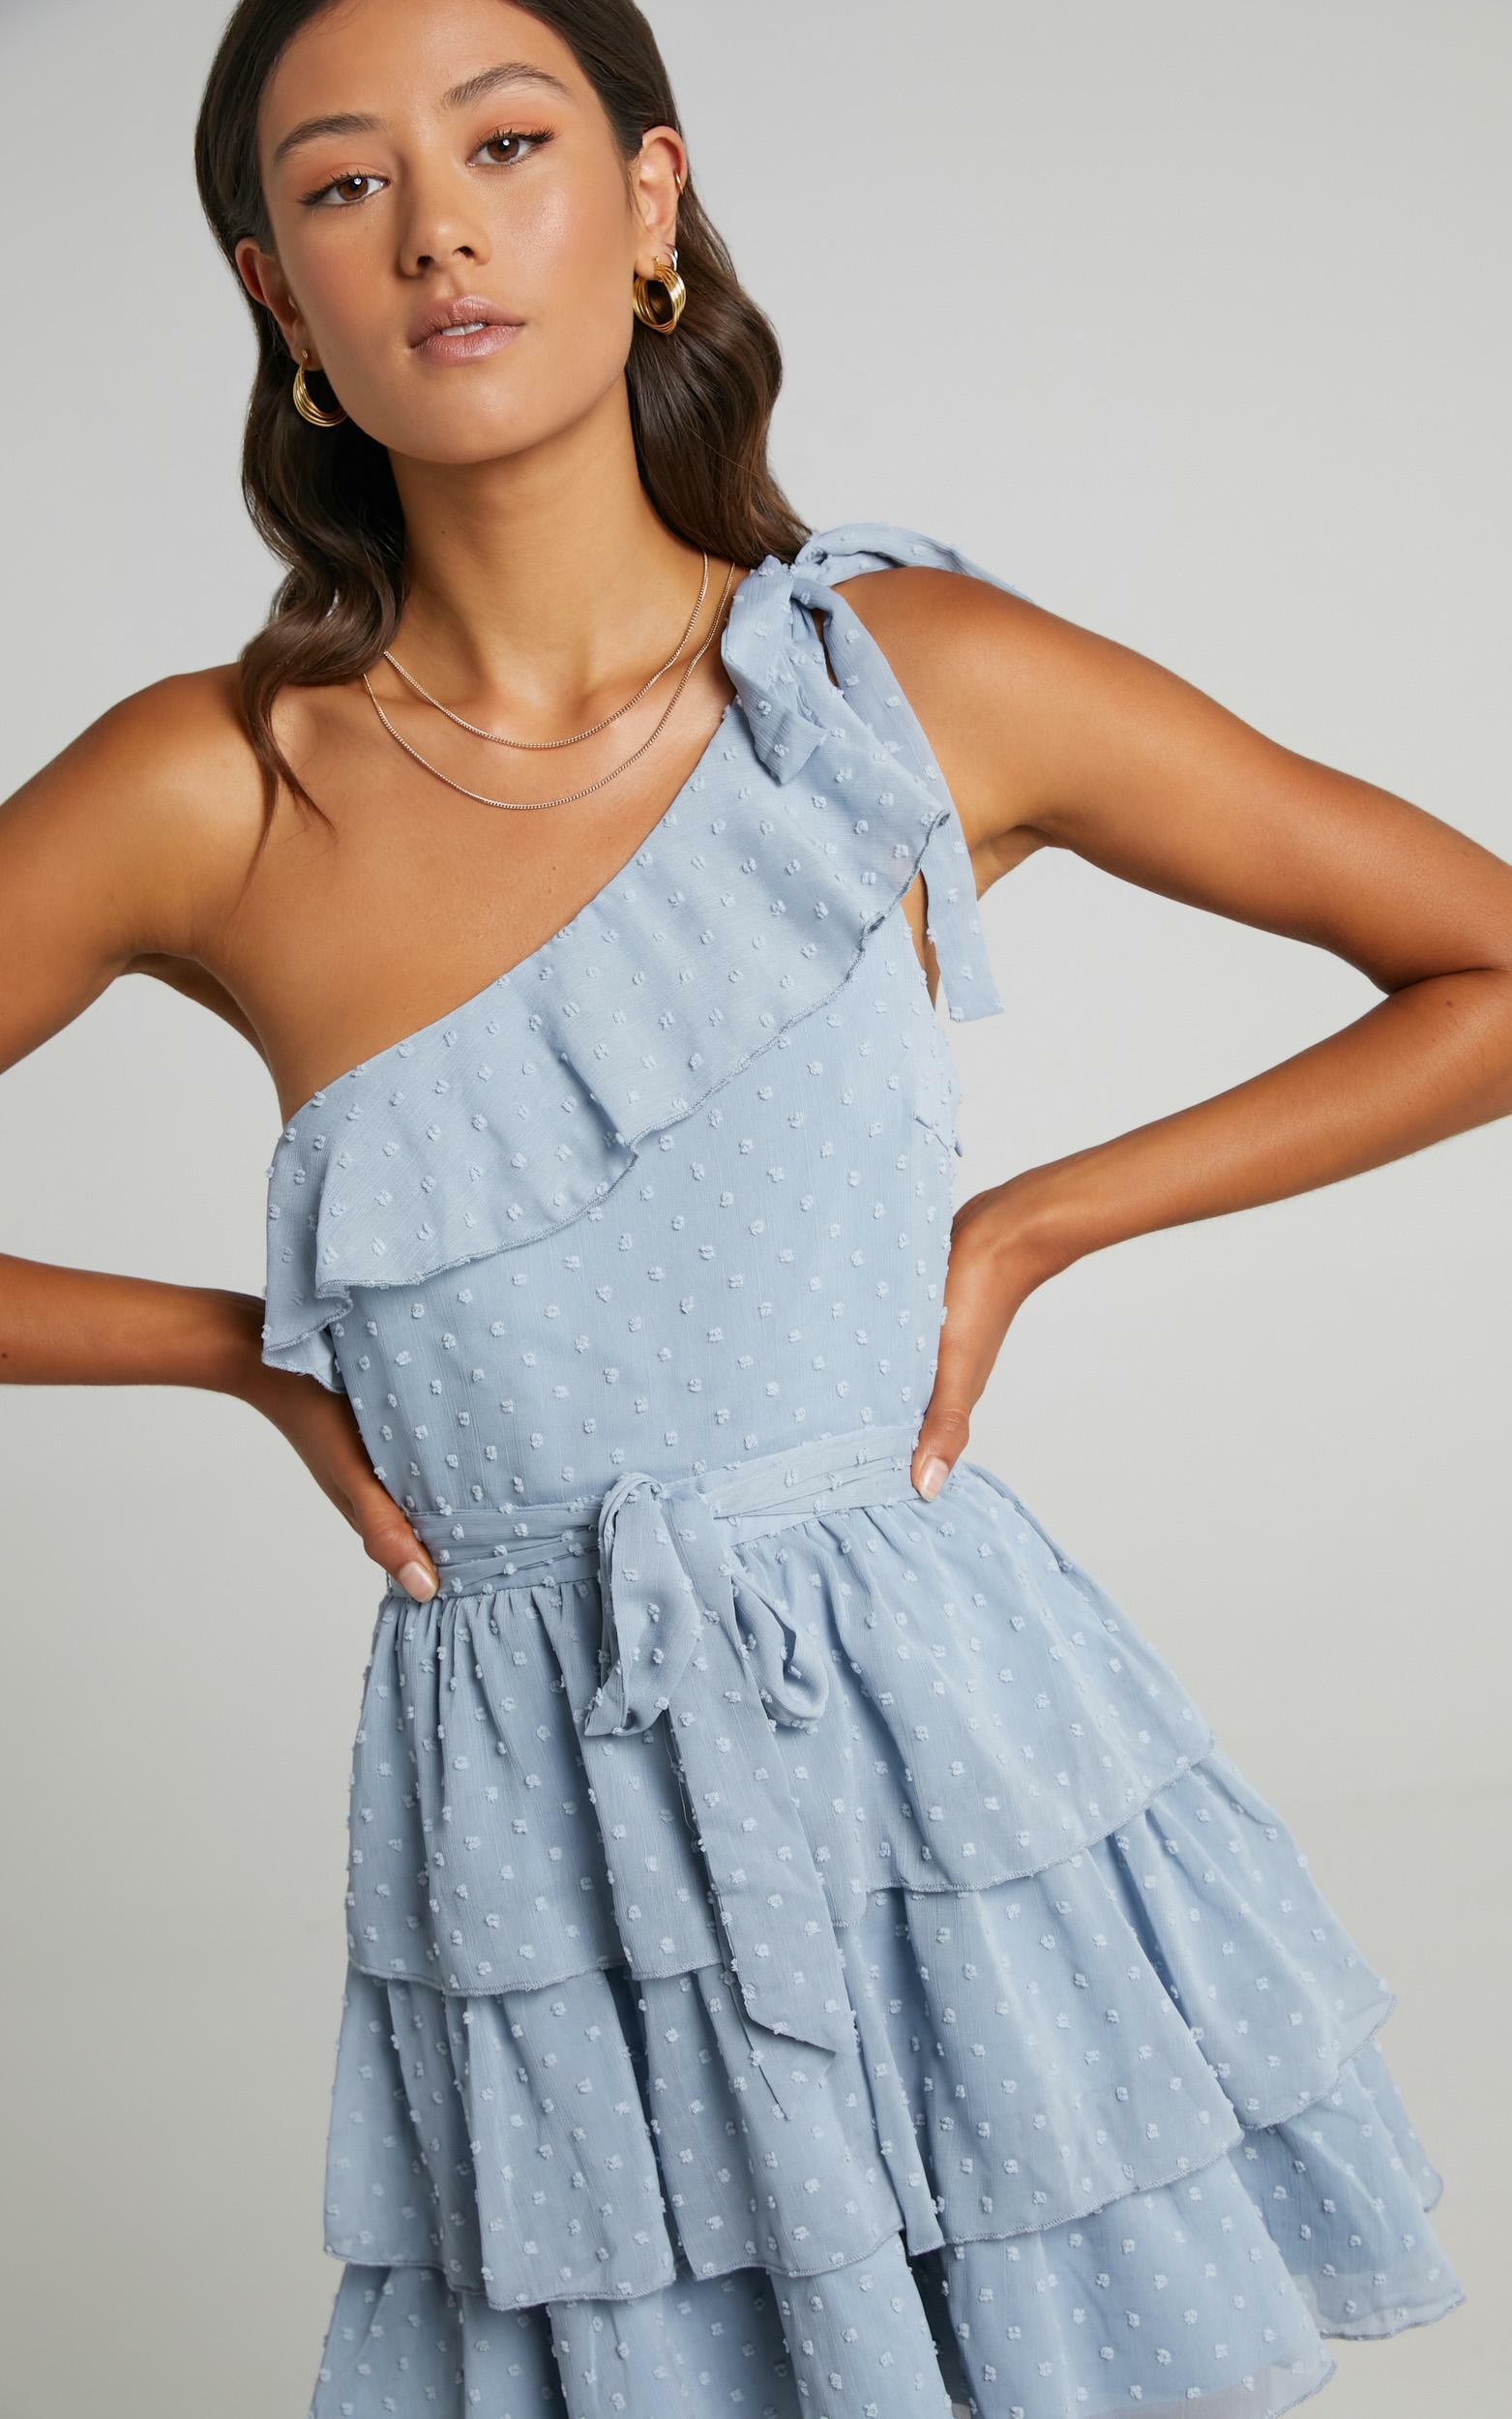 Darling I Am A Daydream One Shoulder Ruffle Mini Dress in Powder Blue - 20, BLU5, hi-res image number null